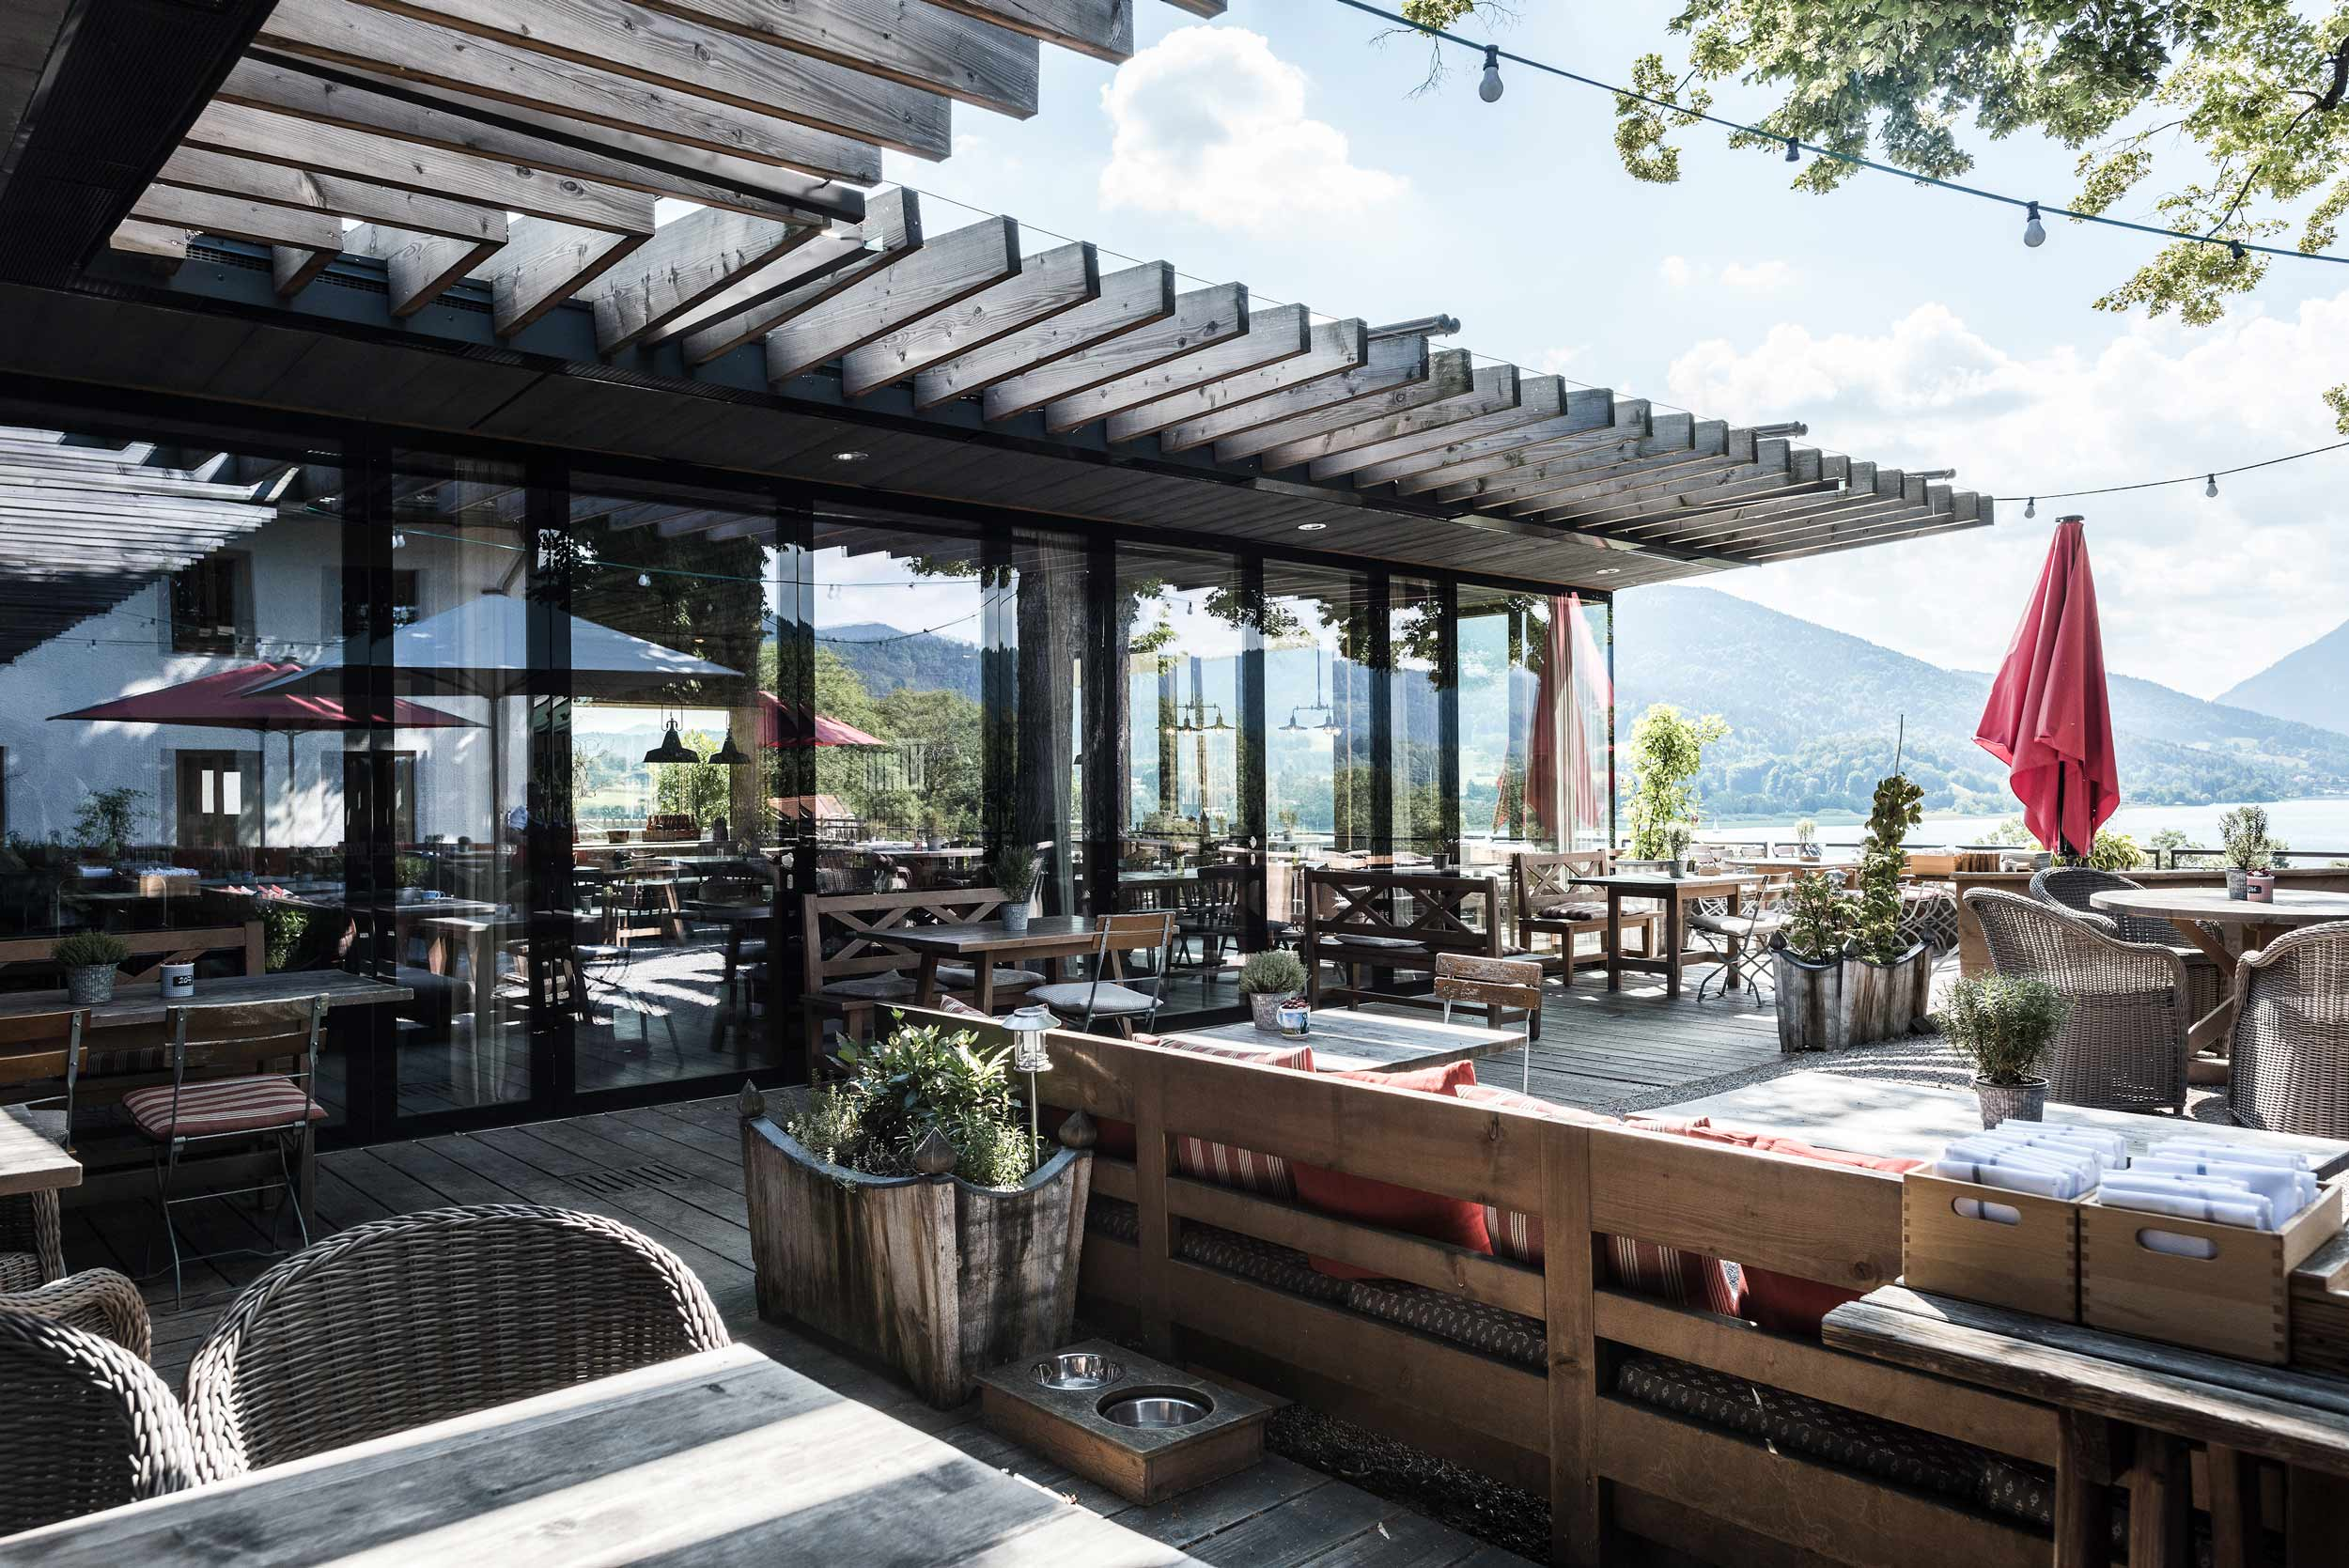 zimmerei-stoib-holzbau-holzhaus-gut-kaltenbrunn-tegernsee-festsaal-restaurant-fassade-sanierung-käfer-biergarten-terrasse-18.jpg